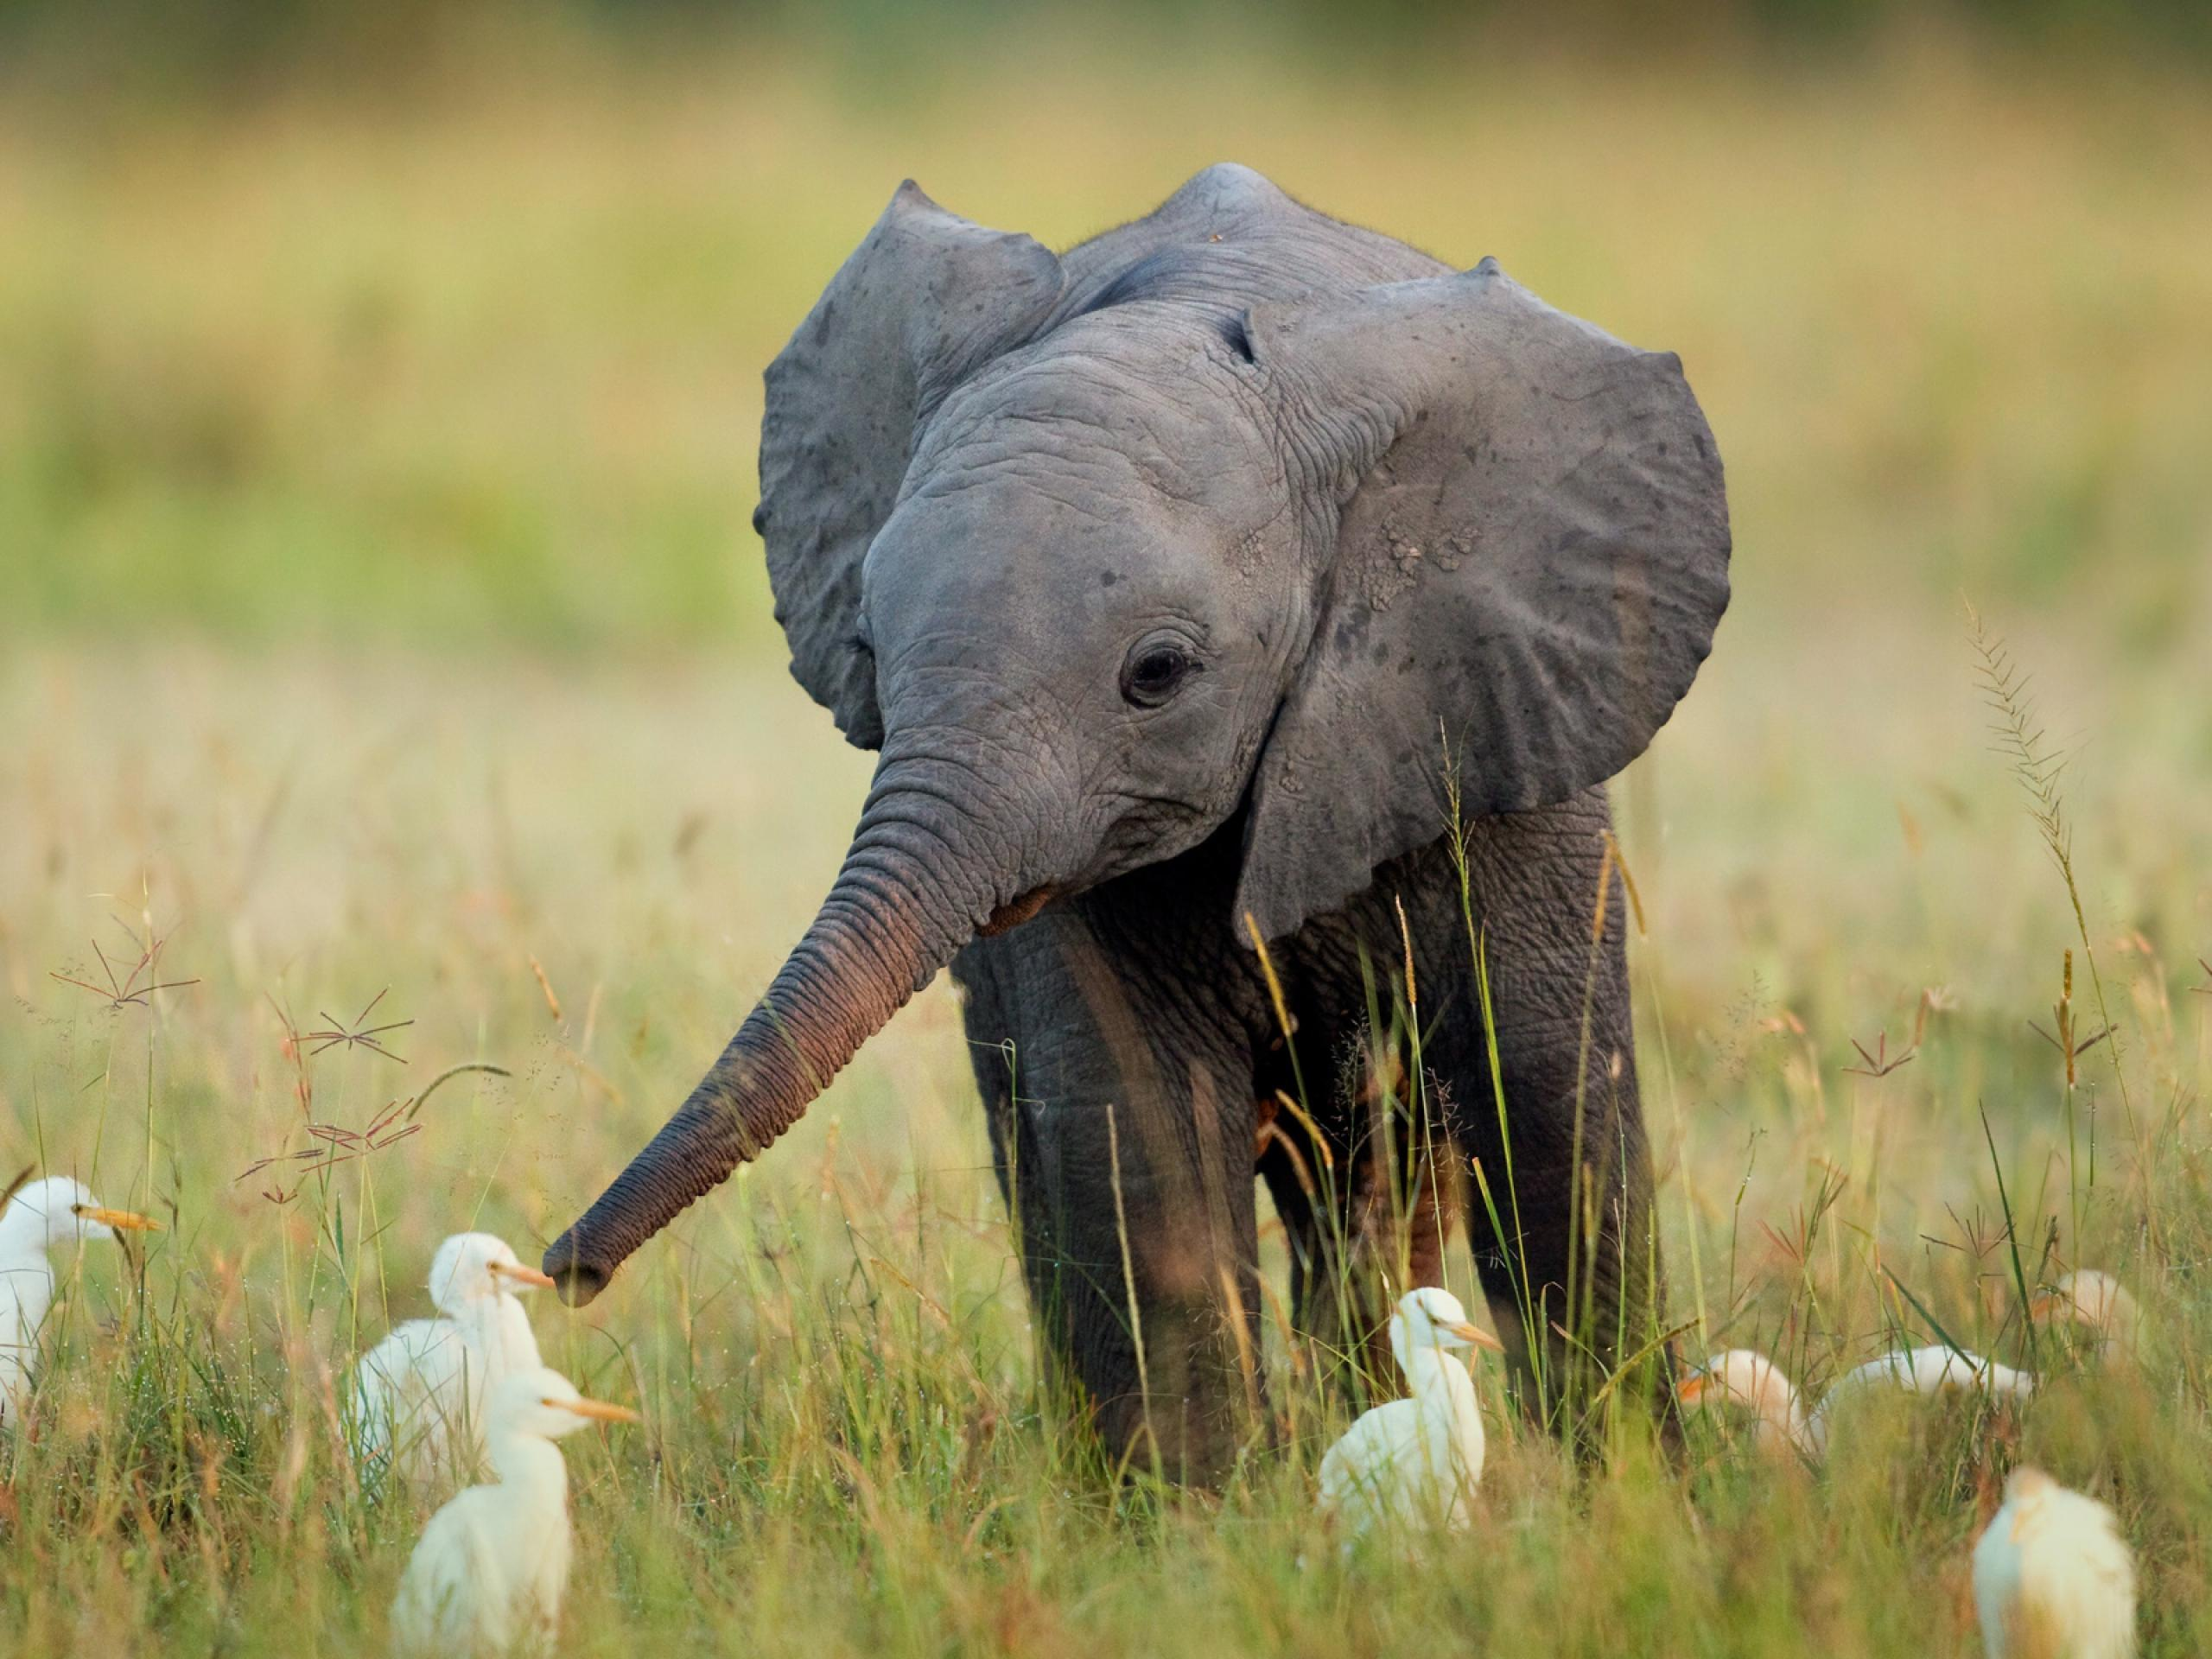 Best 25+ Images of elephant ideas on Pinterest